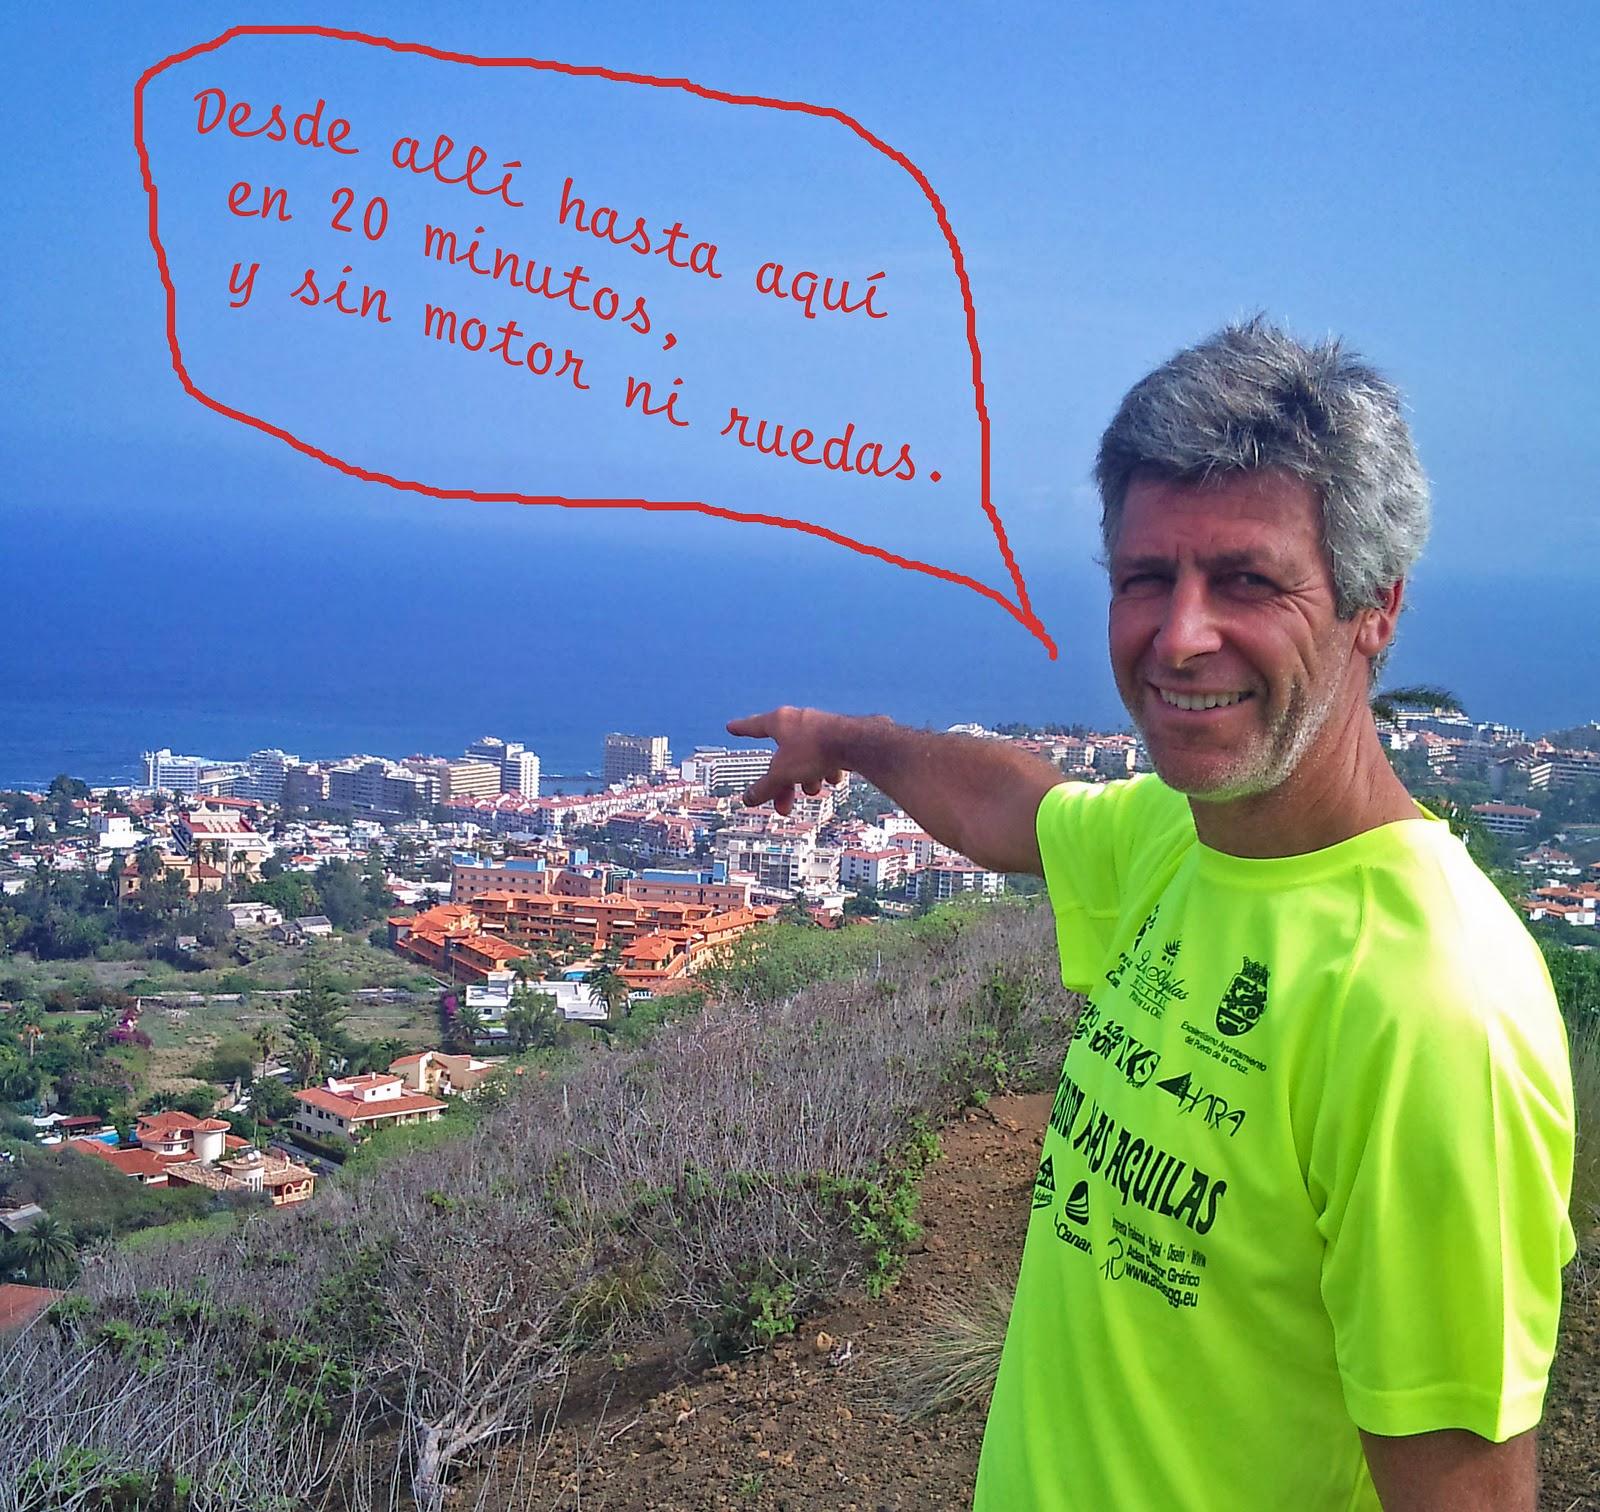 Blog de un vigorexico carrera subida a las aguilas for El jo motor inn